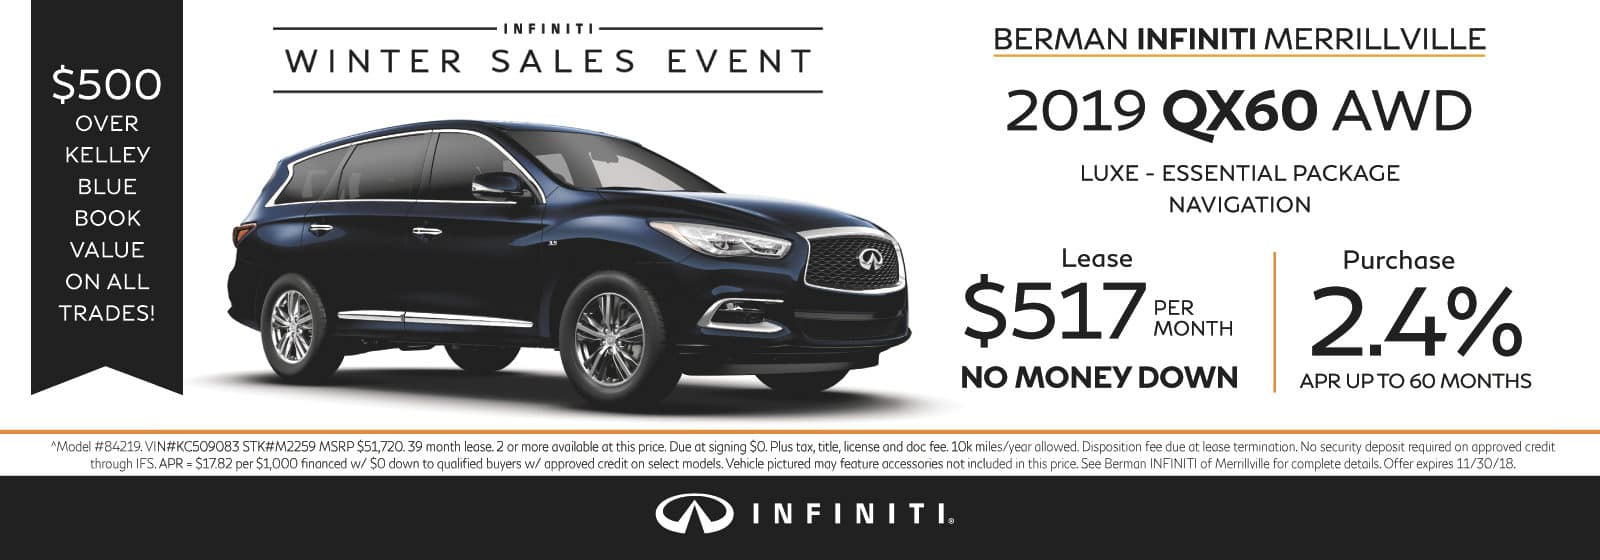 New 2019 INFINITI QX60 November Offer at Berman INFINITI of Merrillville!